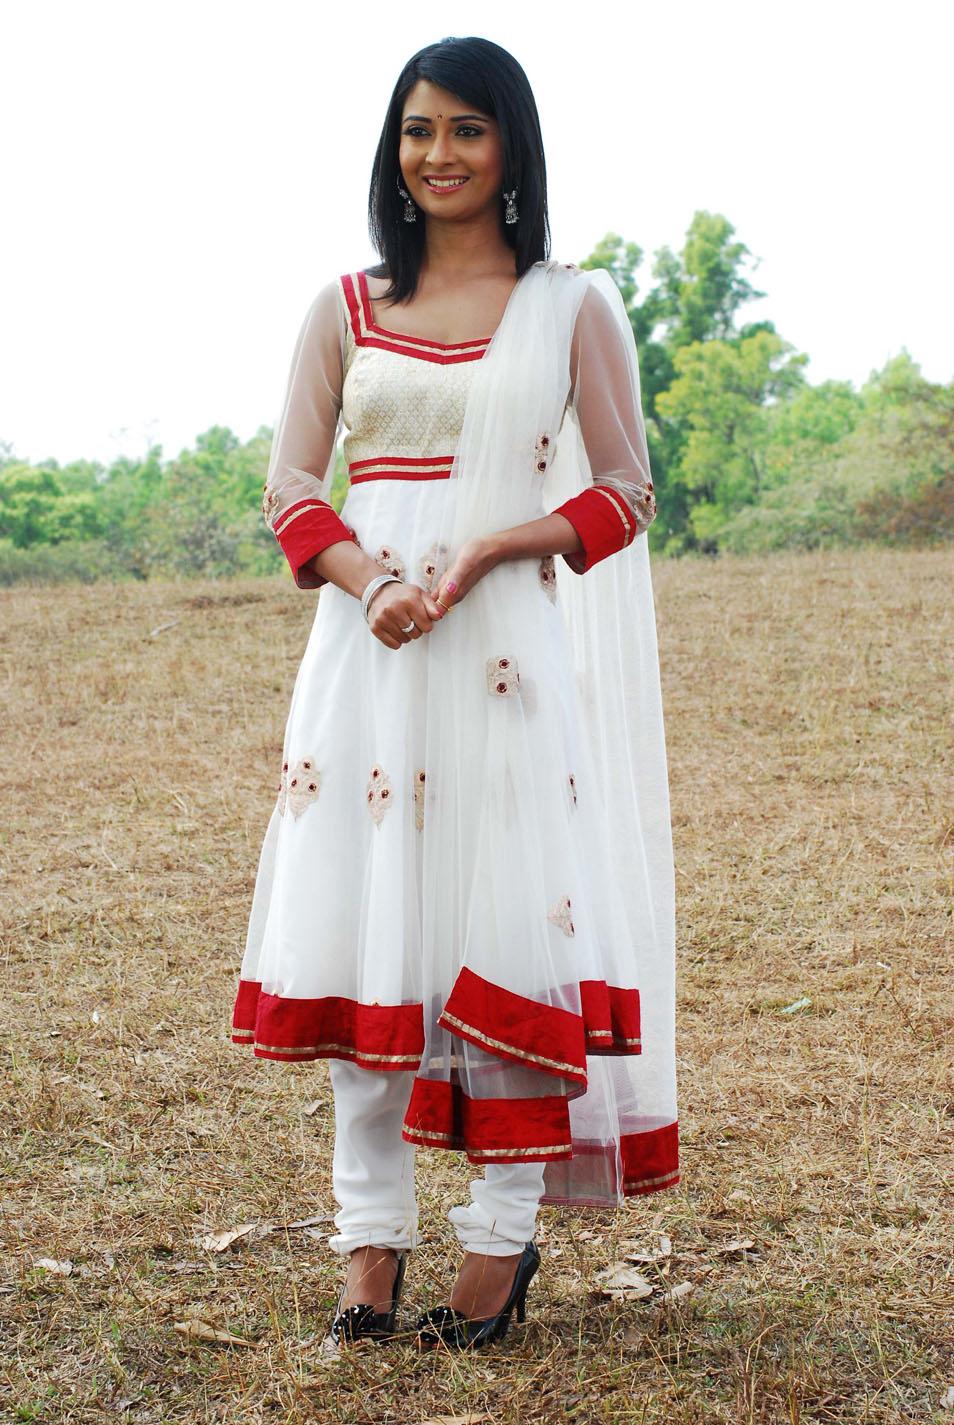 Malayalam Actress Radhika Navel Radhika pandit latest hot